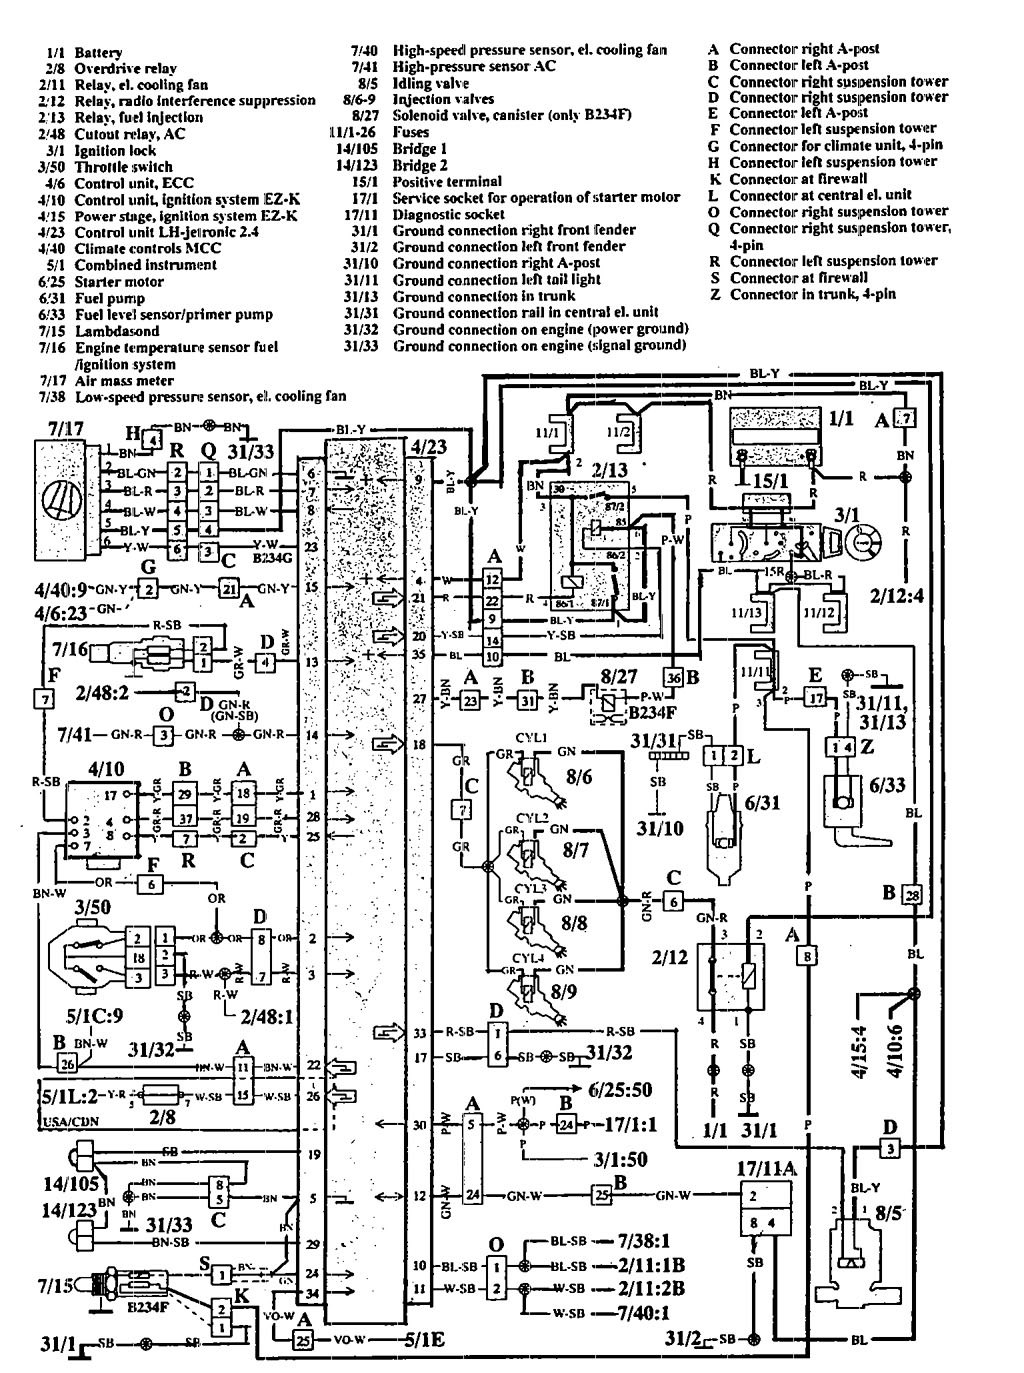 wiring diagram volvo 940 se 17 1 beyonddogs nl \u2022